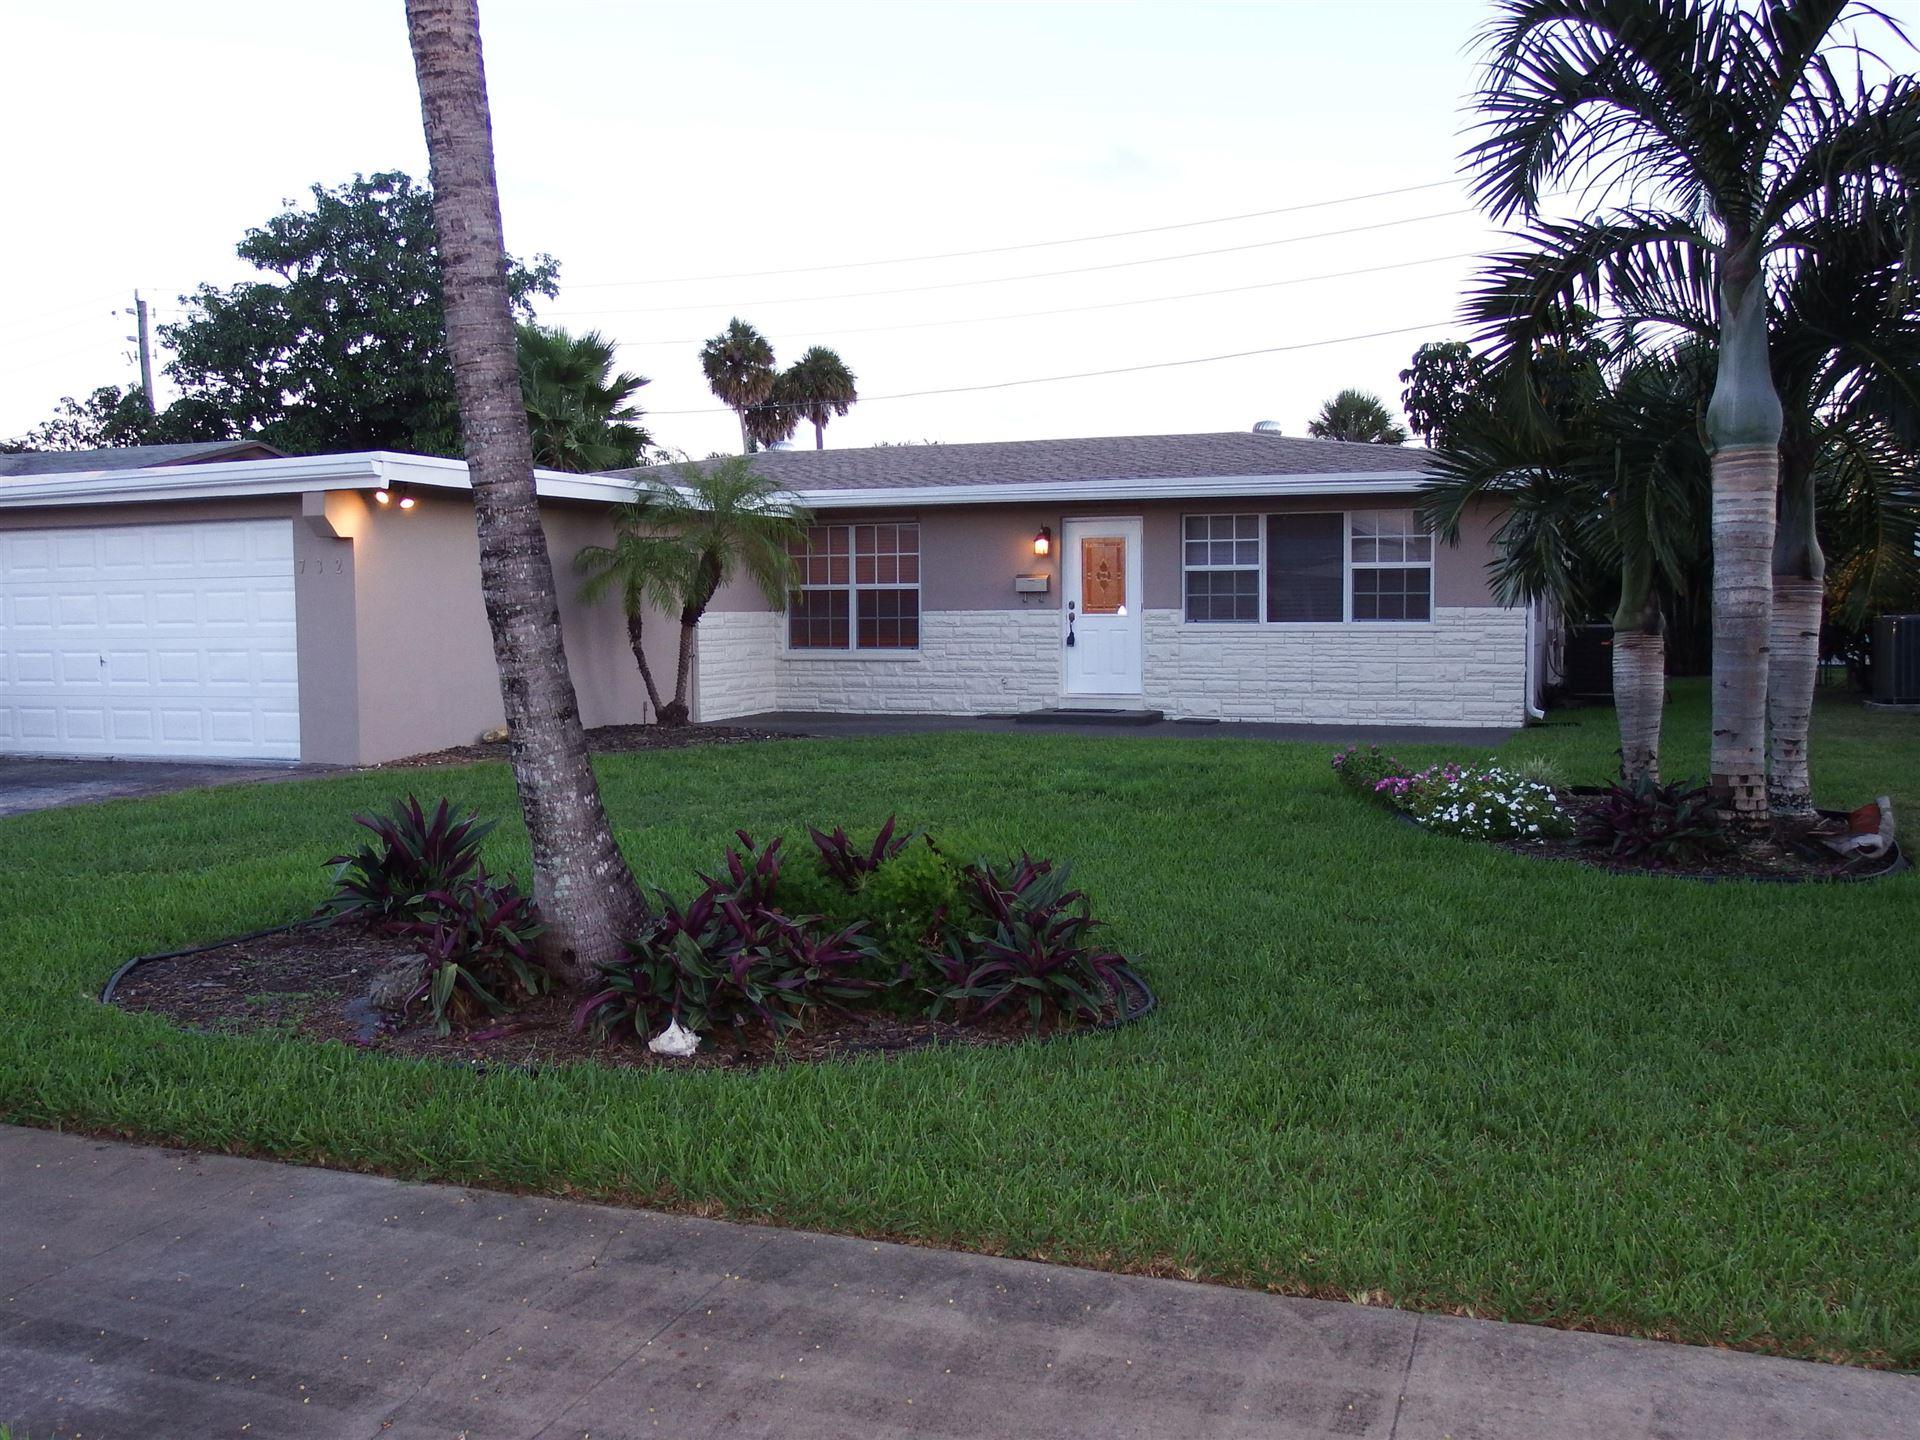 Photo of 732 NW 28 Street, Wilton Manors, FL 33311 (MLS # RX-10724692)